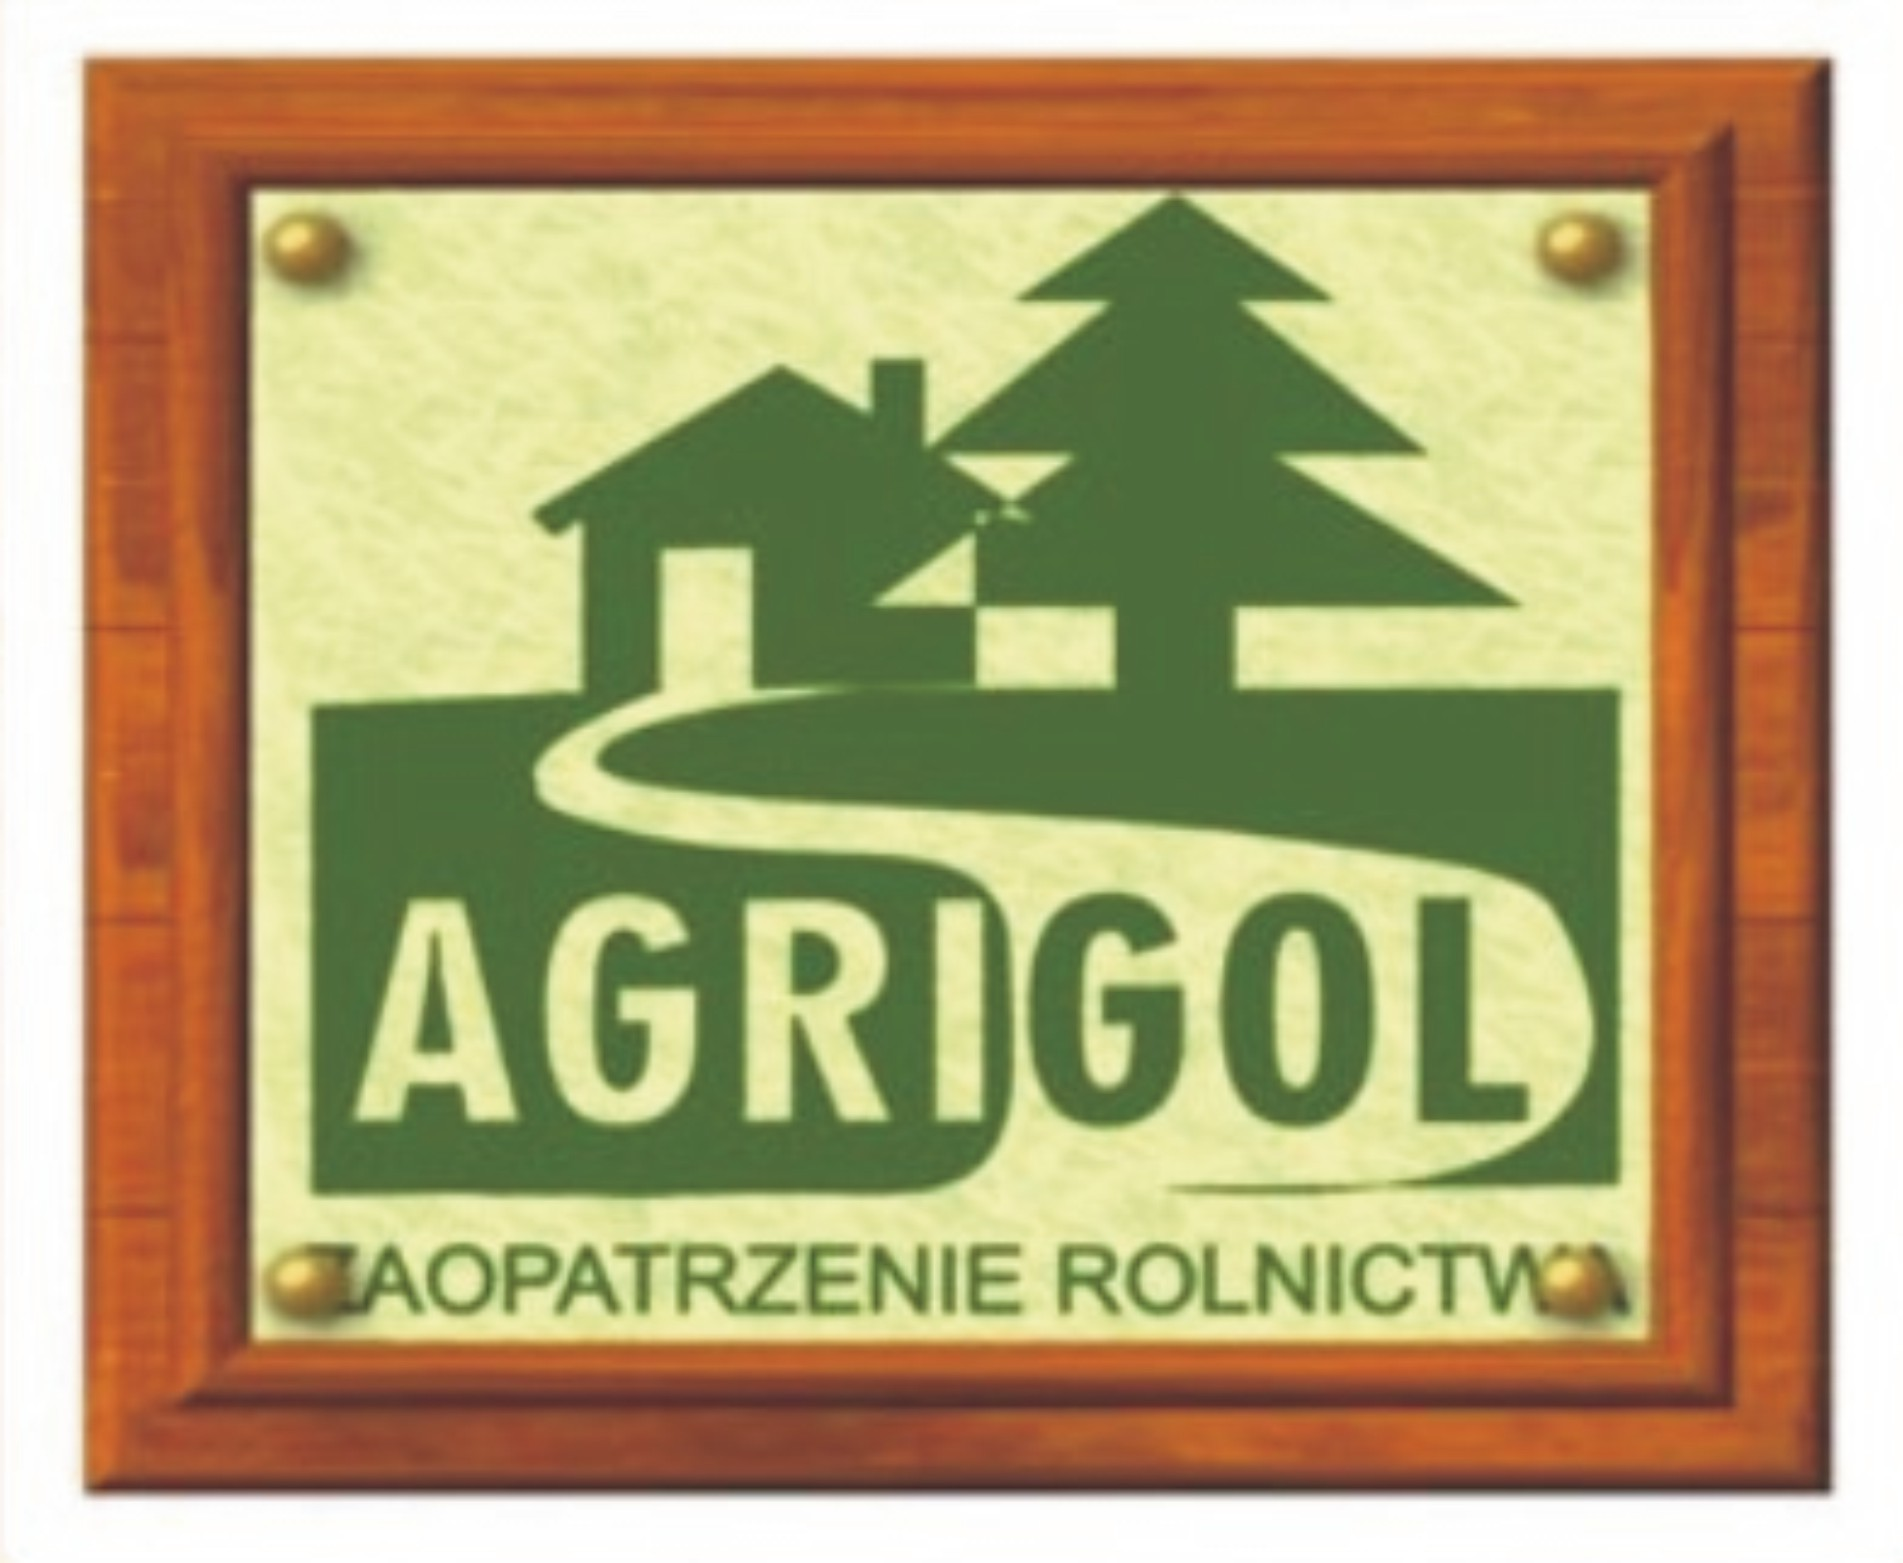 agrigol Golub-Dobrzyń